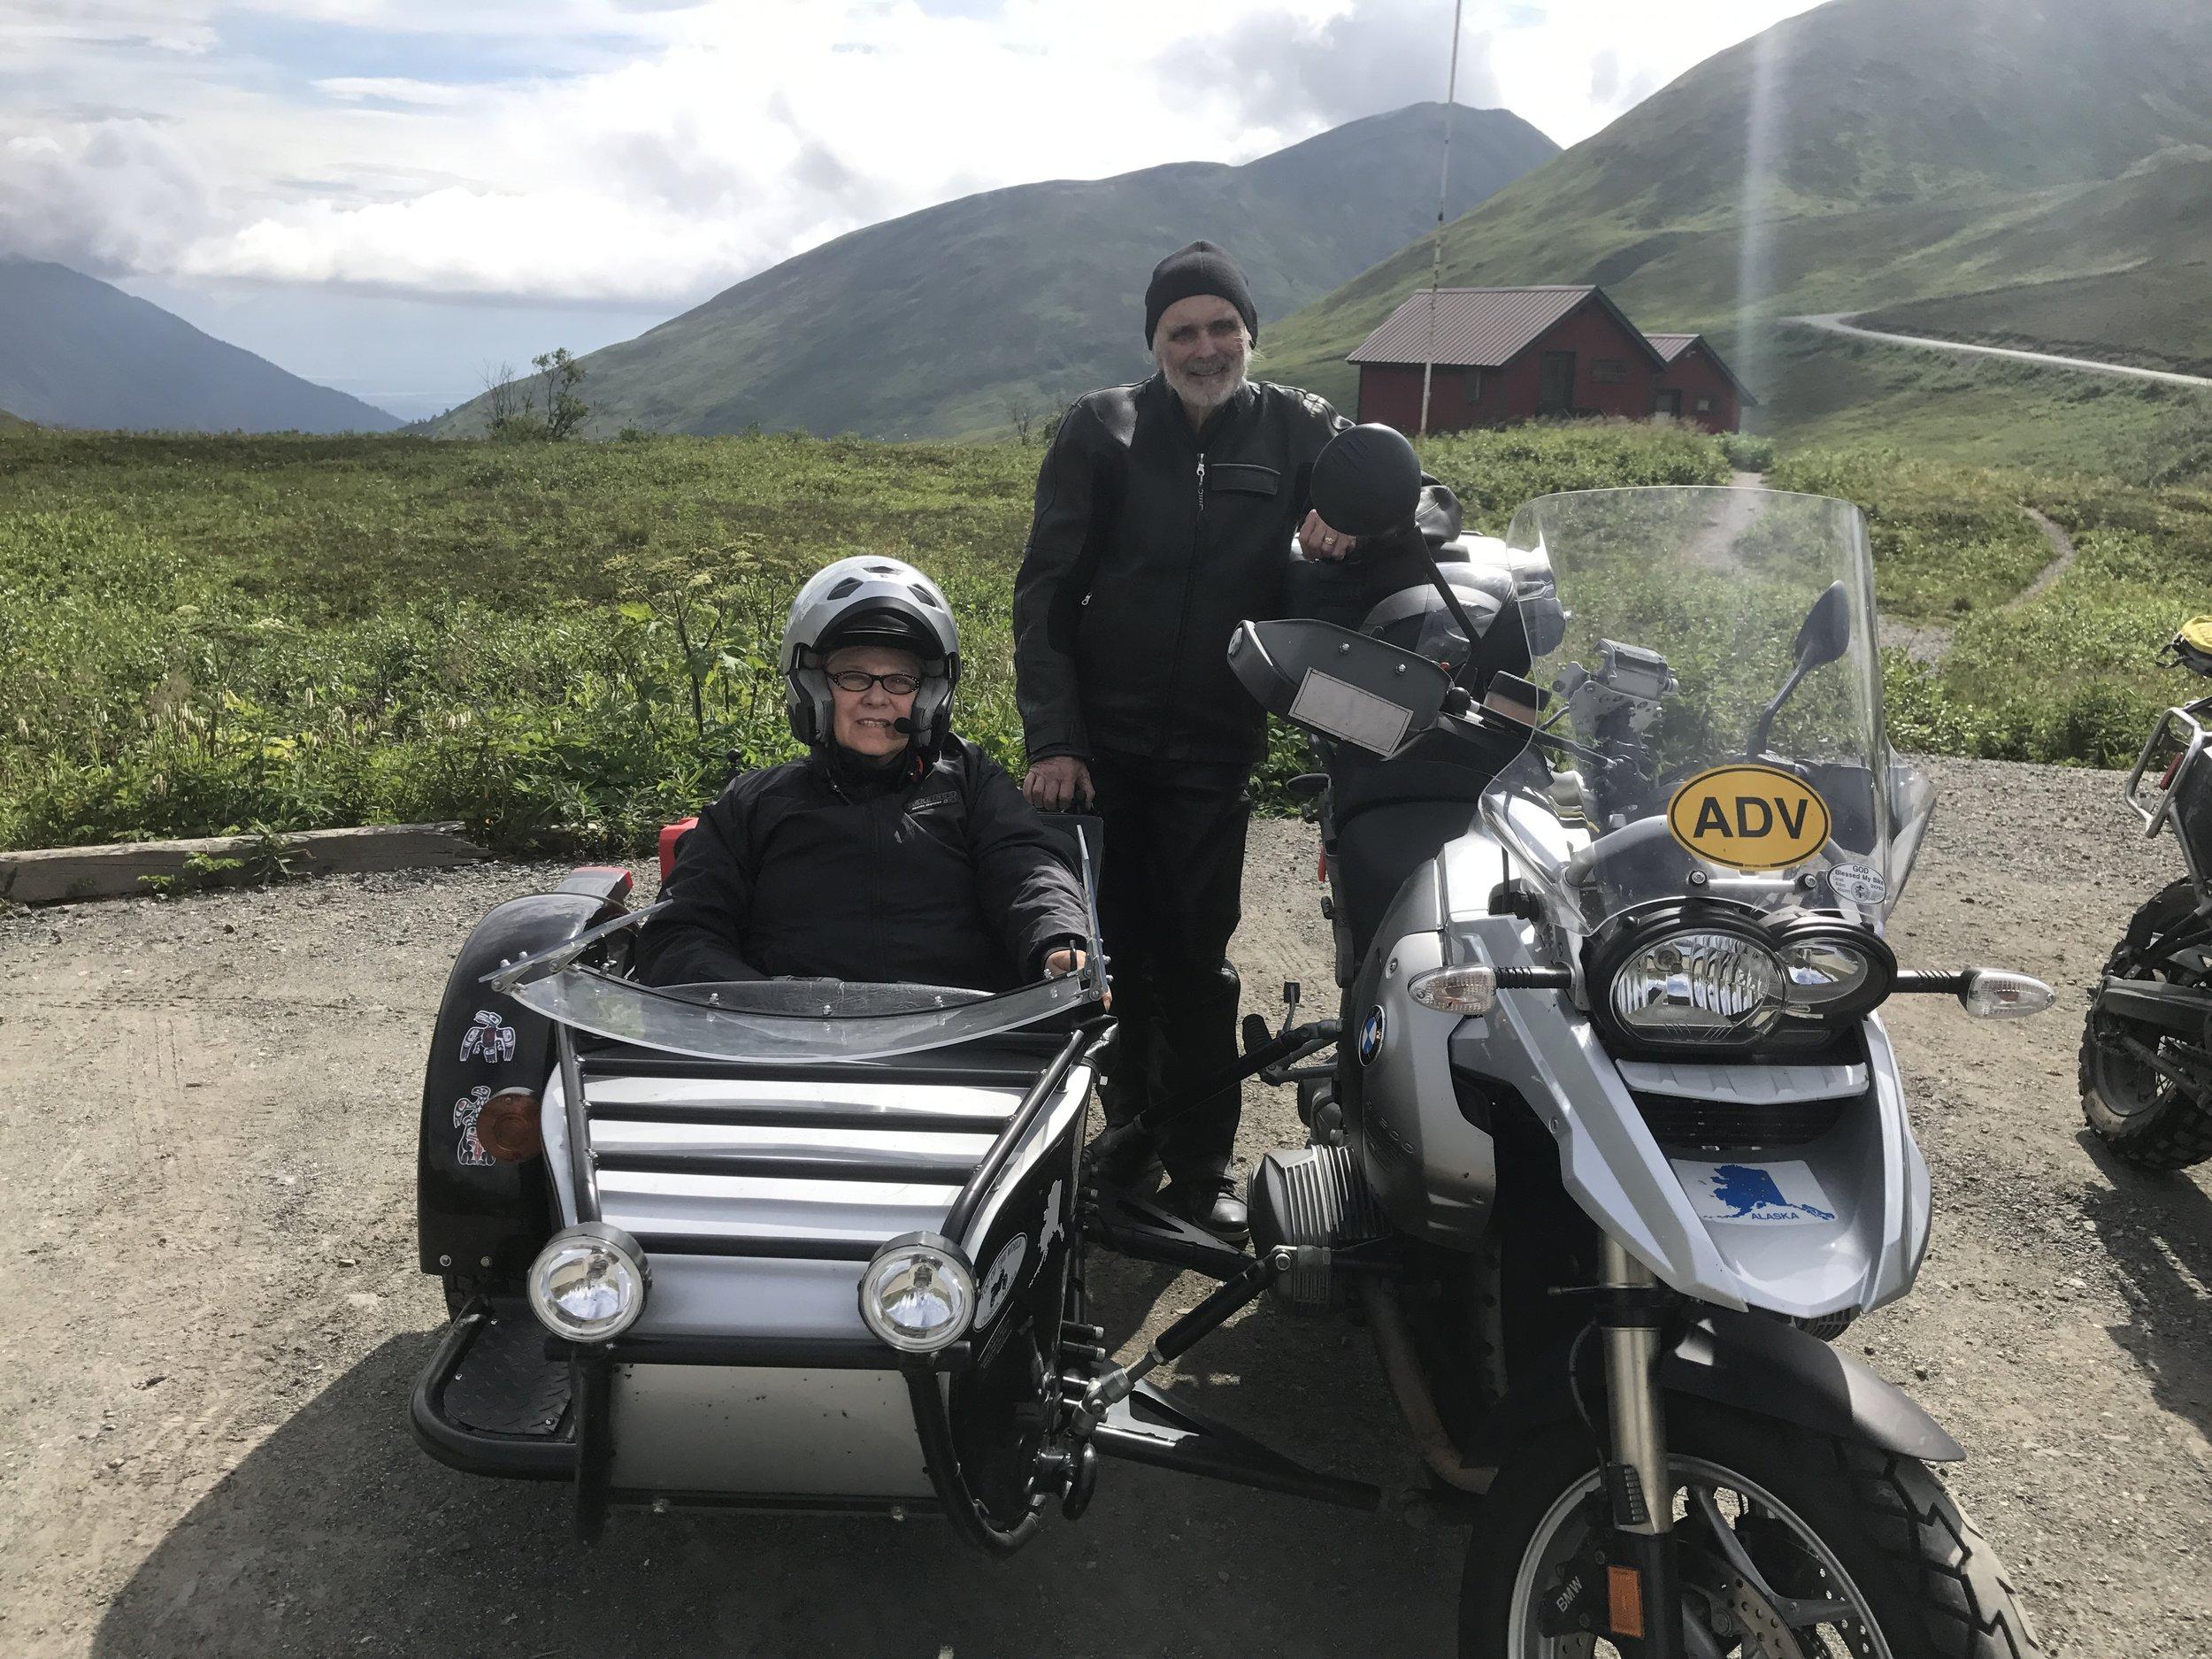 Bob and Sharon ready to ride.